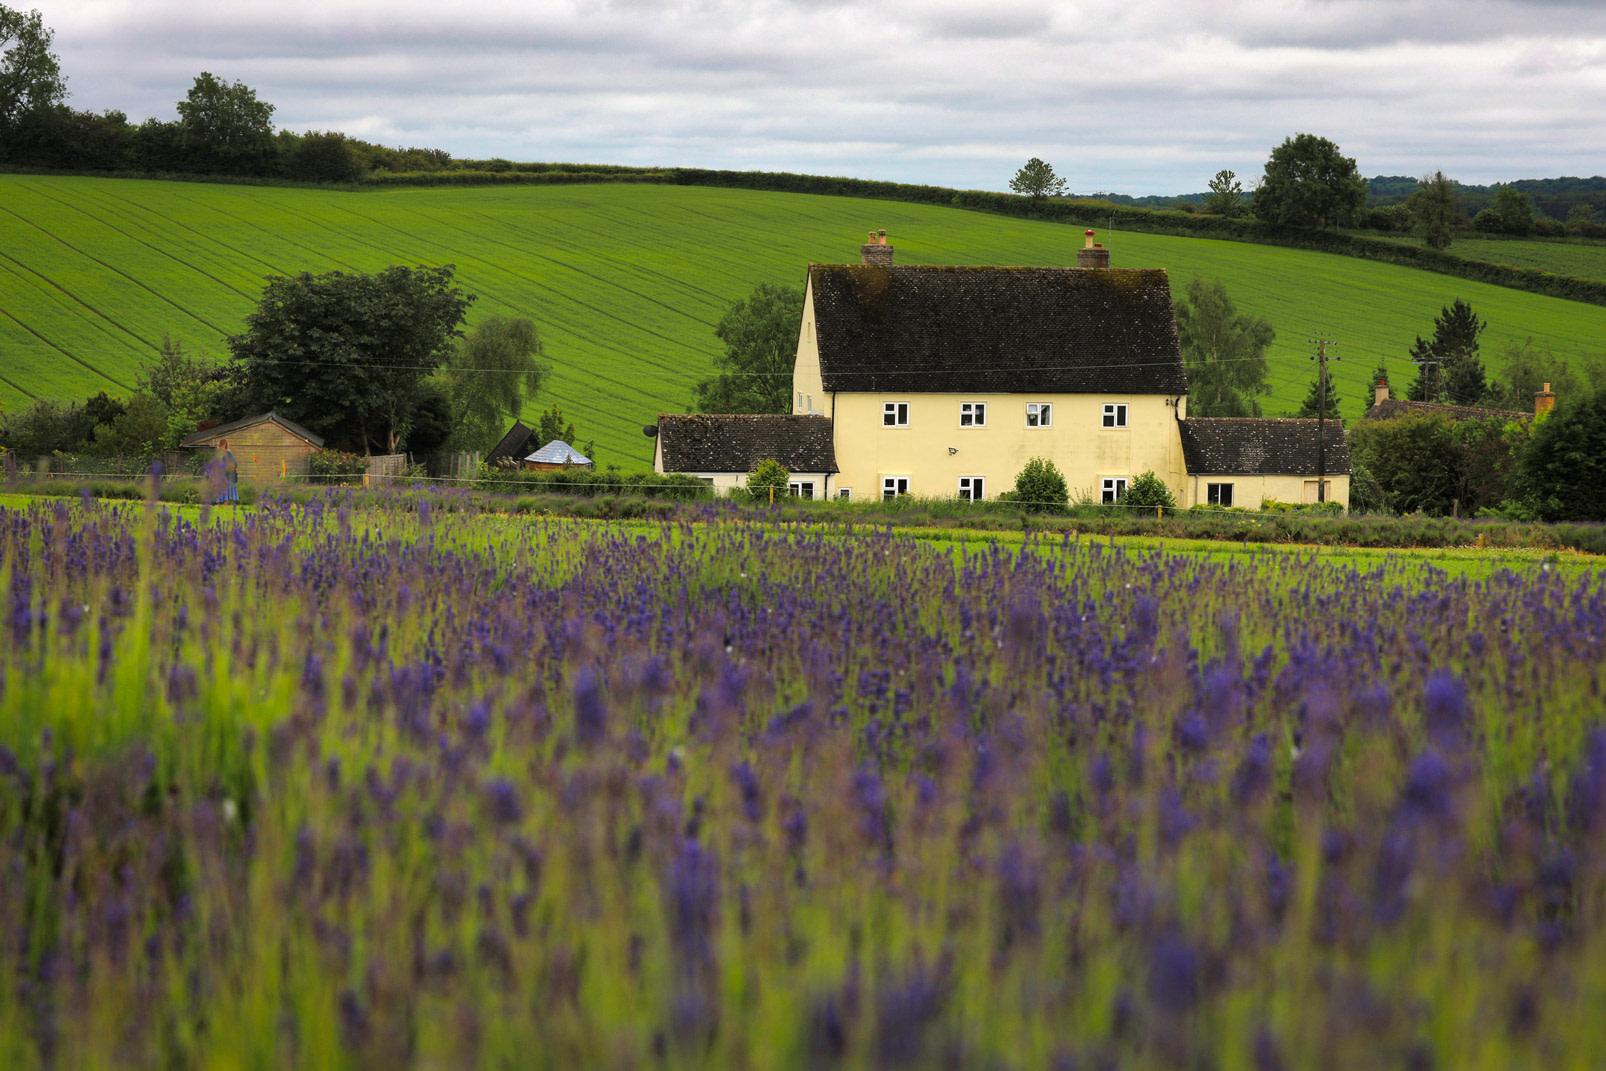 Cotswolds Lavender Fields